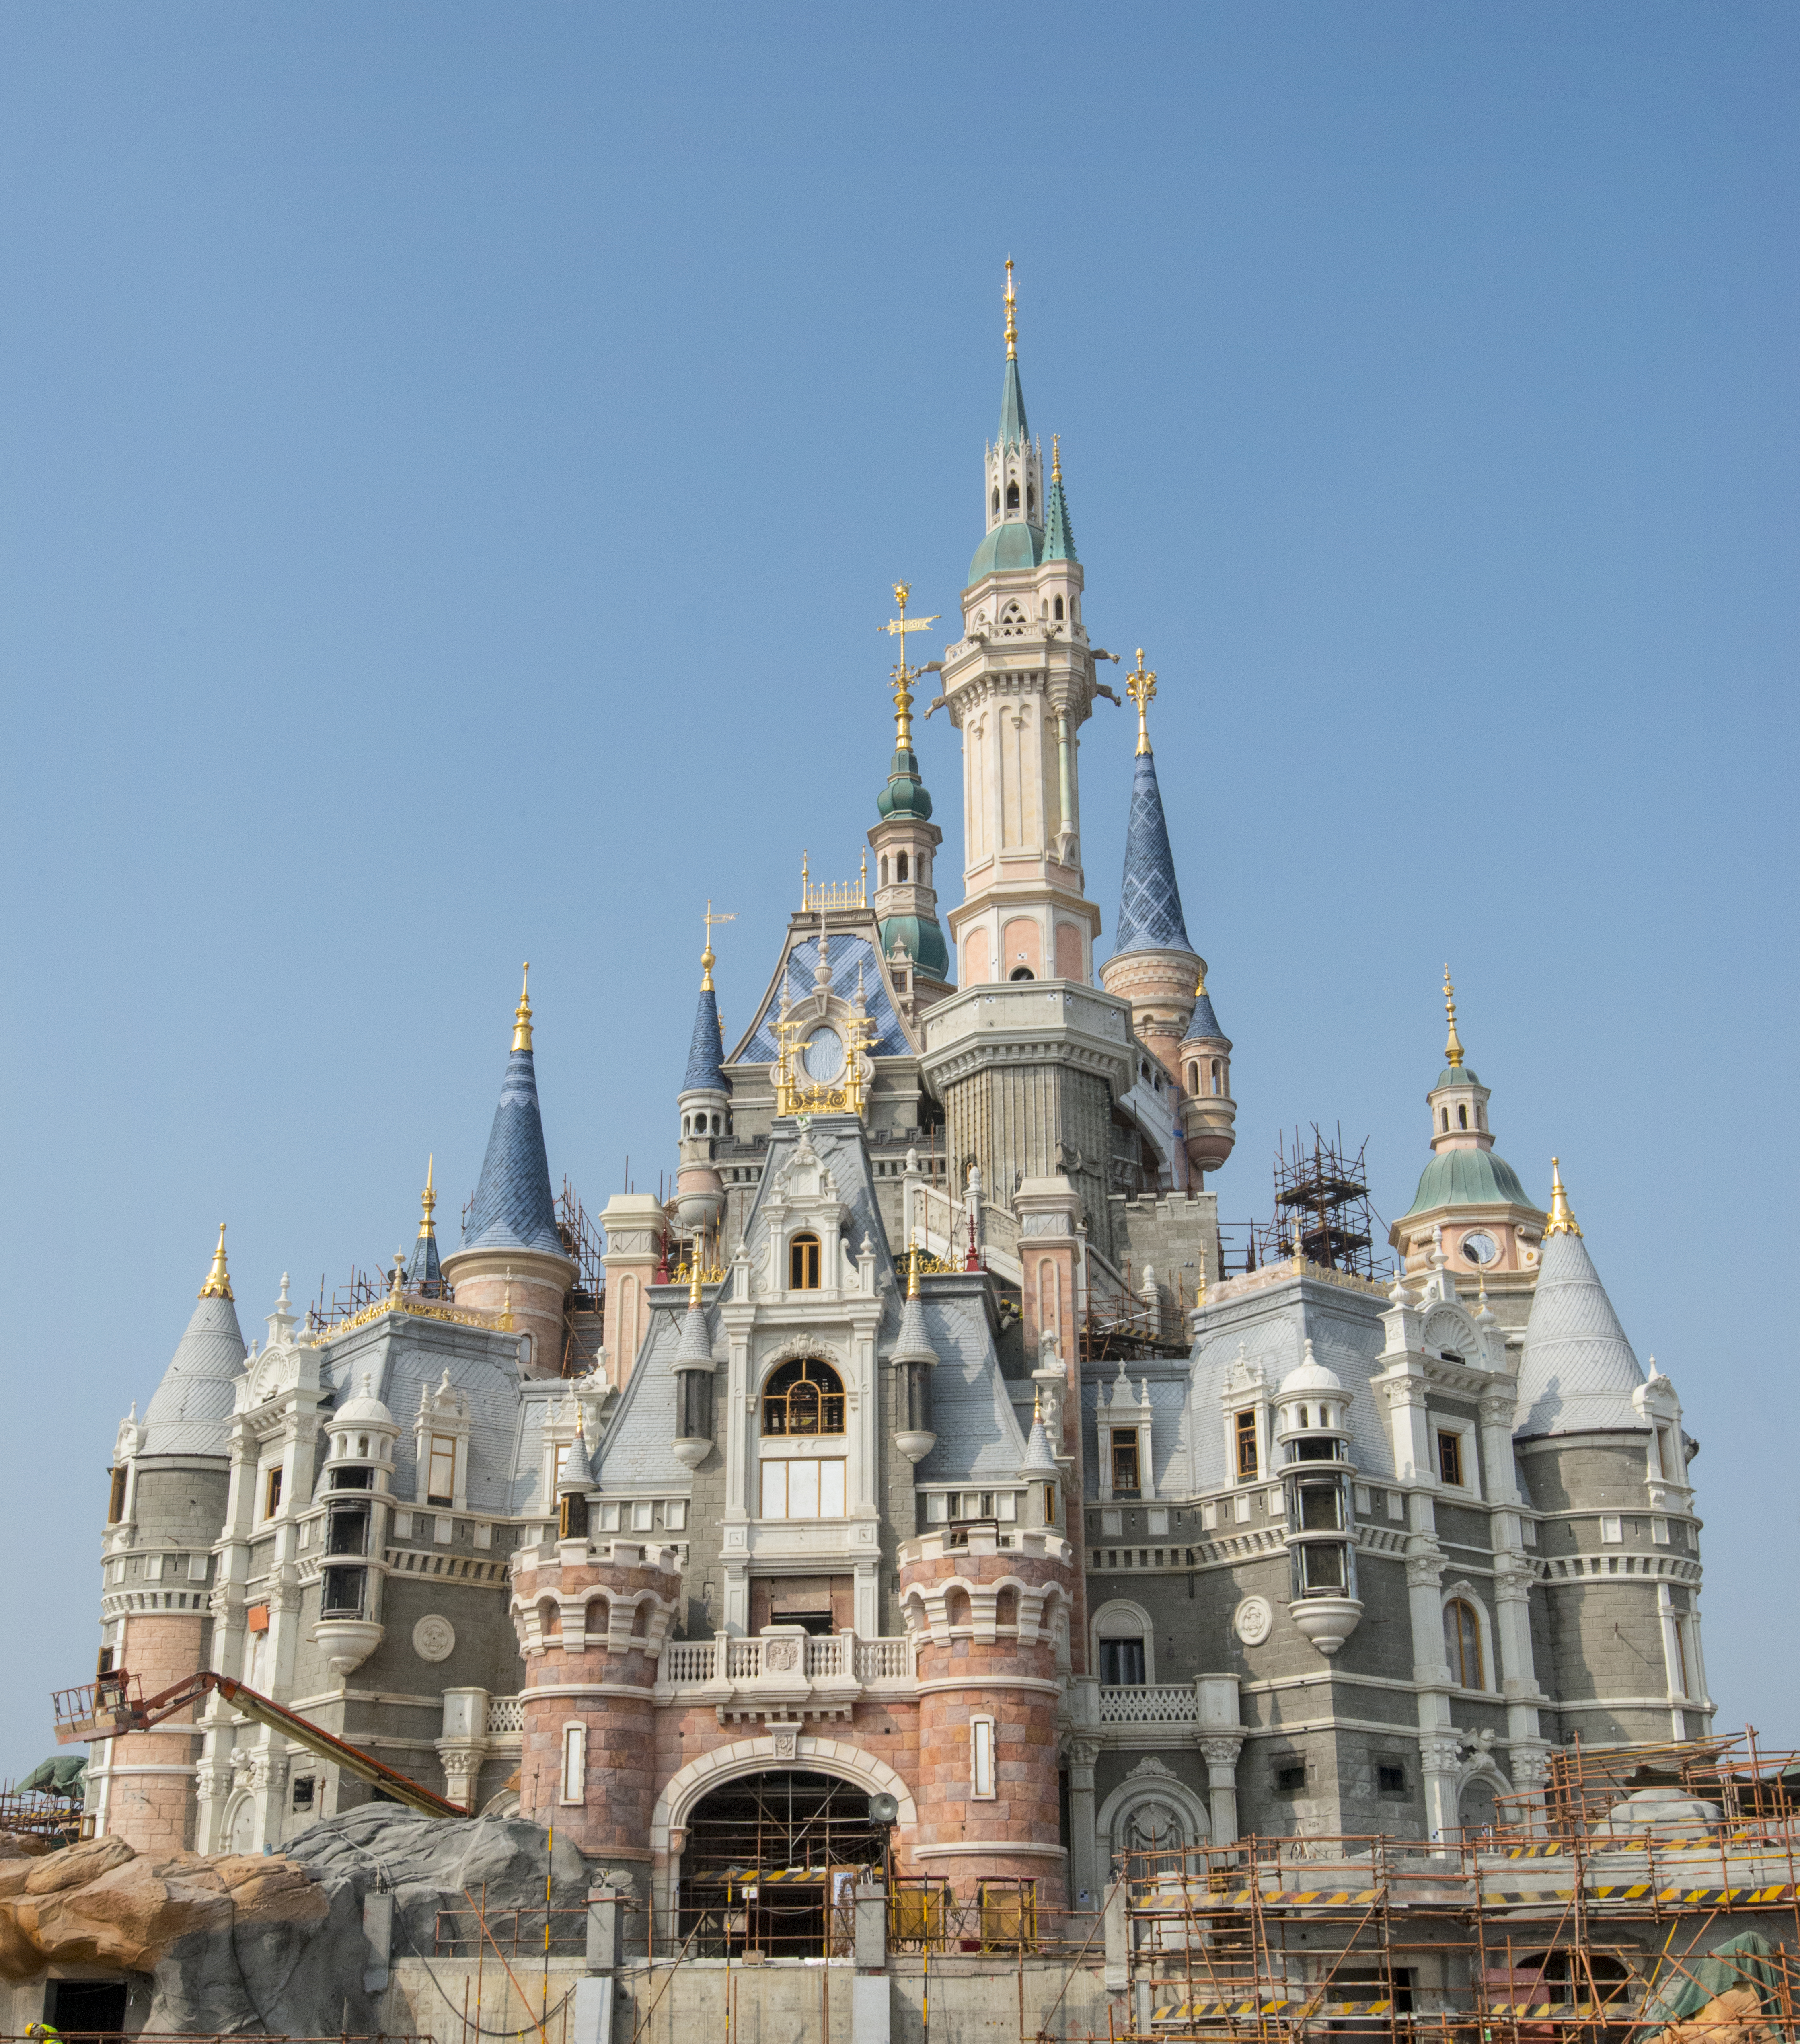 WindowSeat Enchanted Storybook Castle